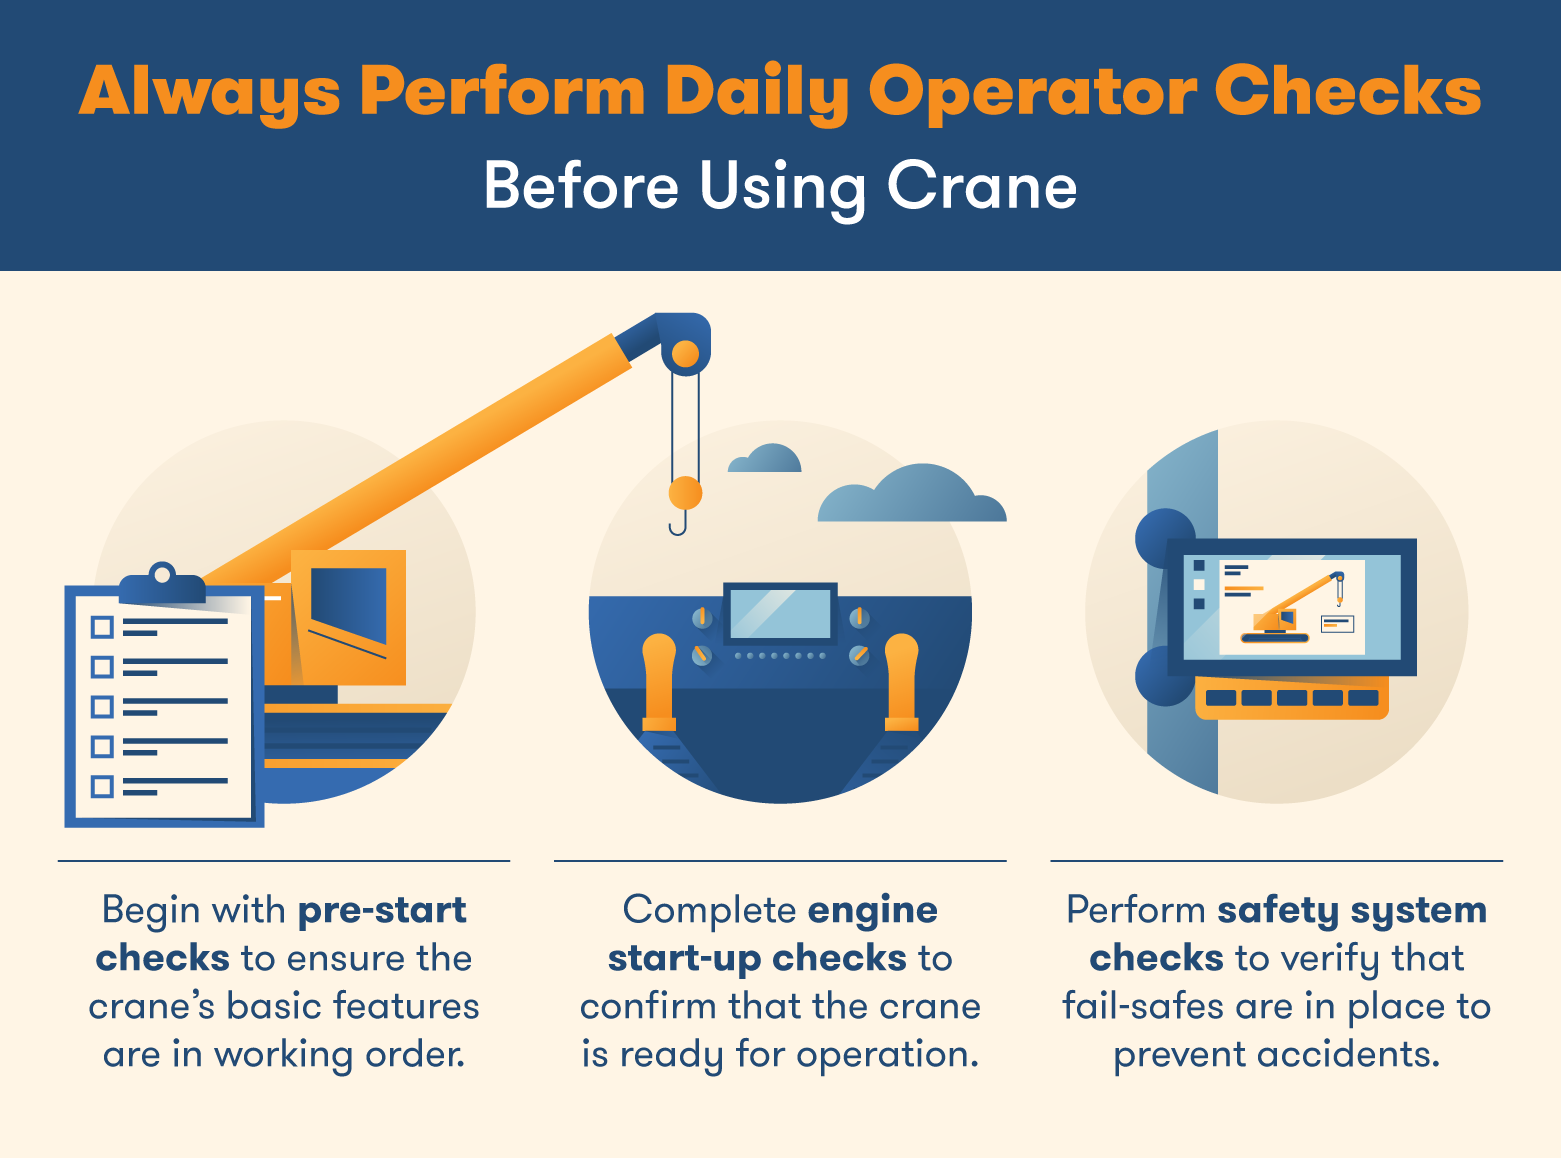 Perform daily operator checks before operating a crane.